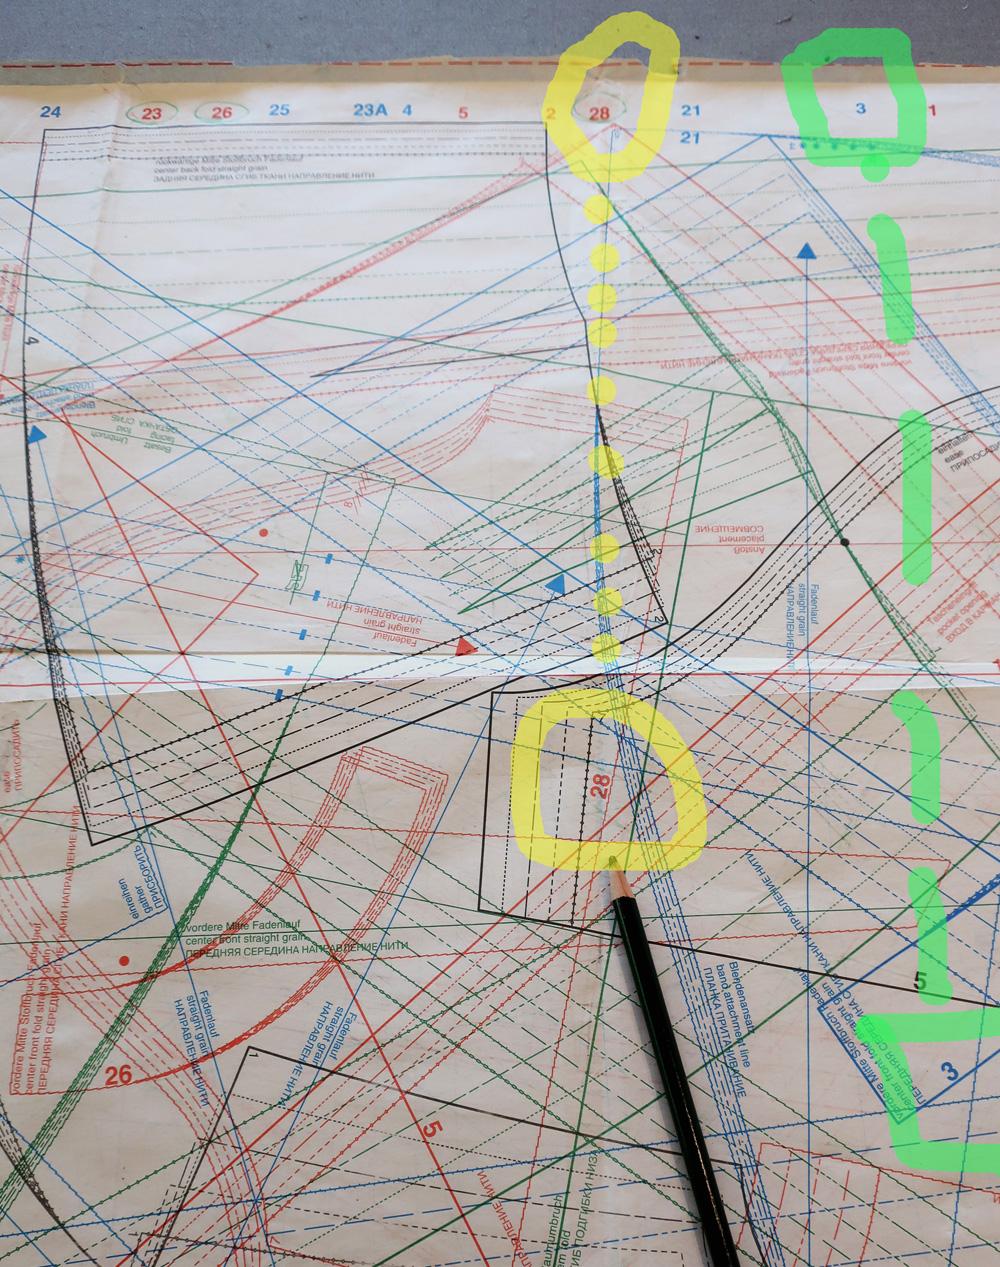 Burda sheet finding piece numbers